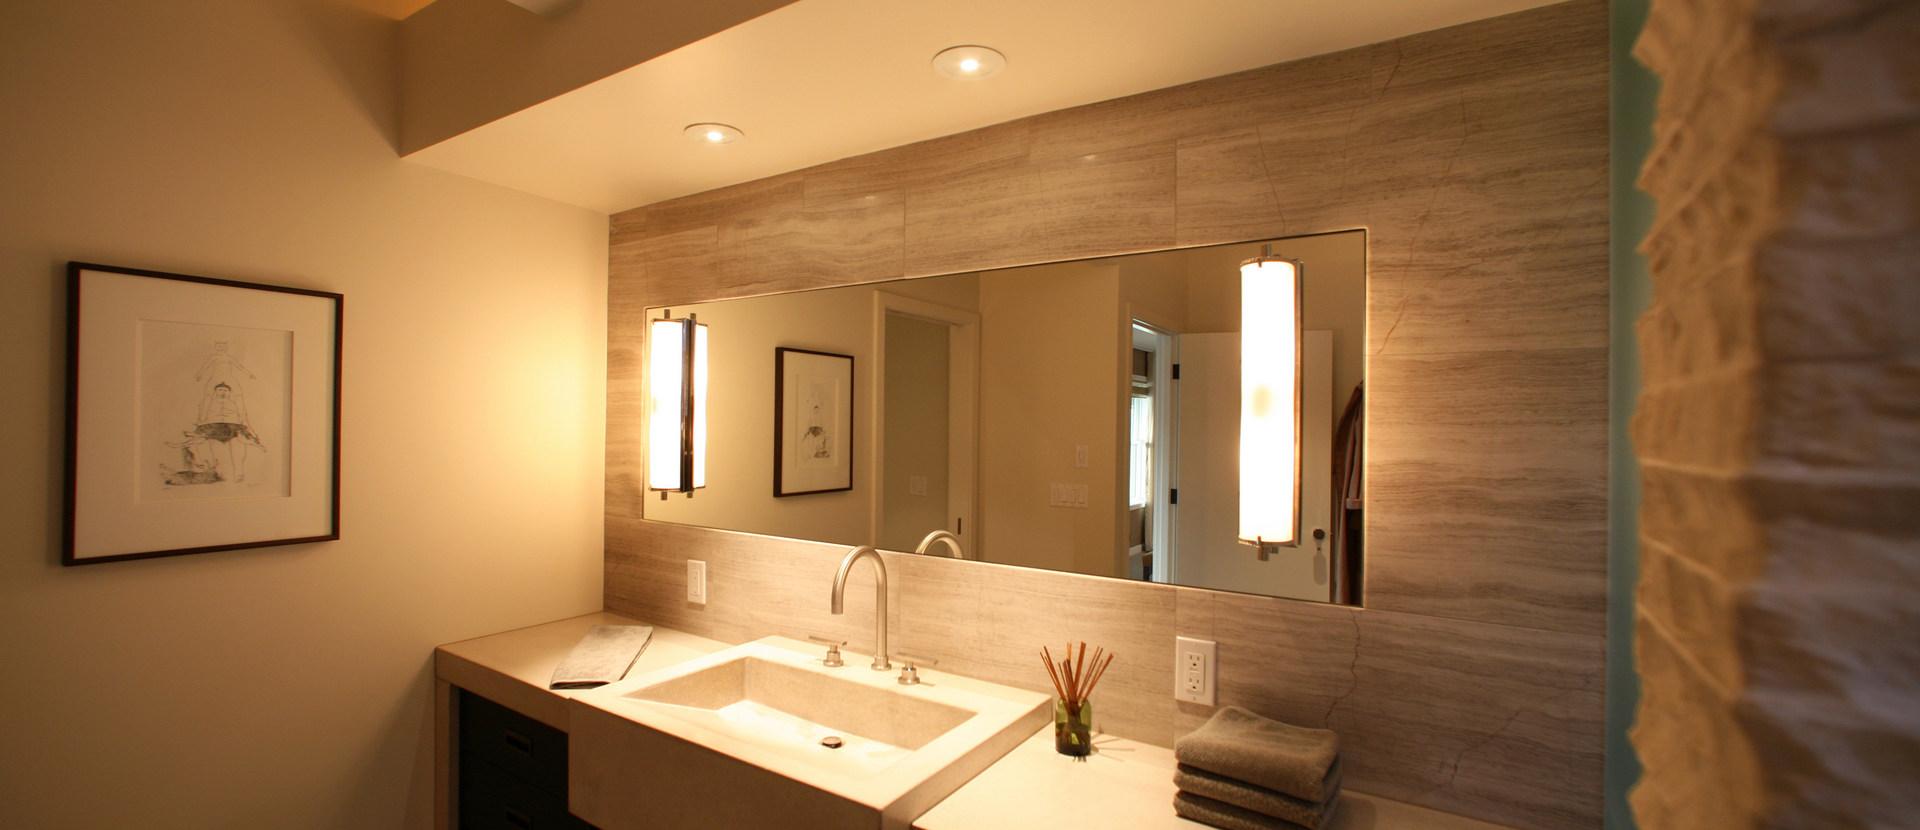 concrete-sink.jpg